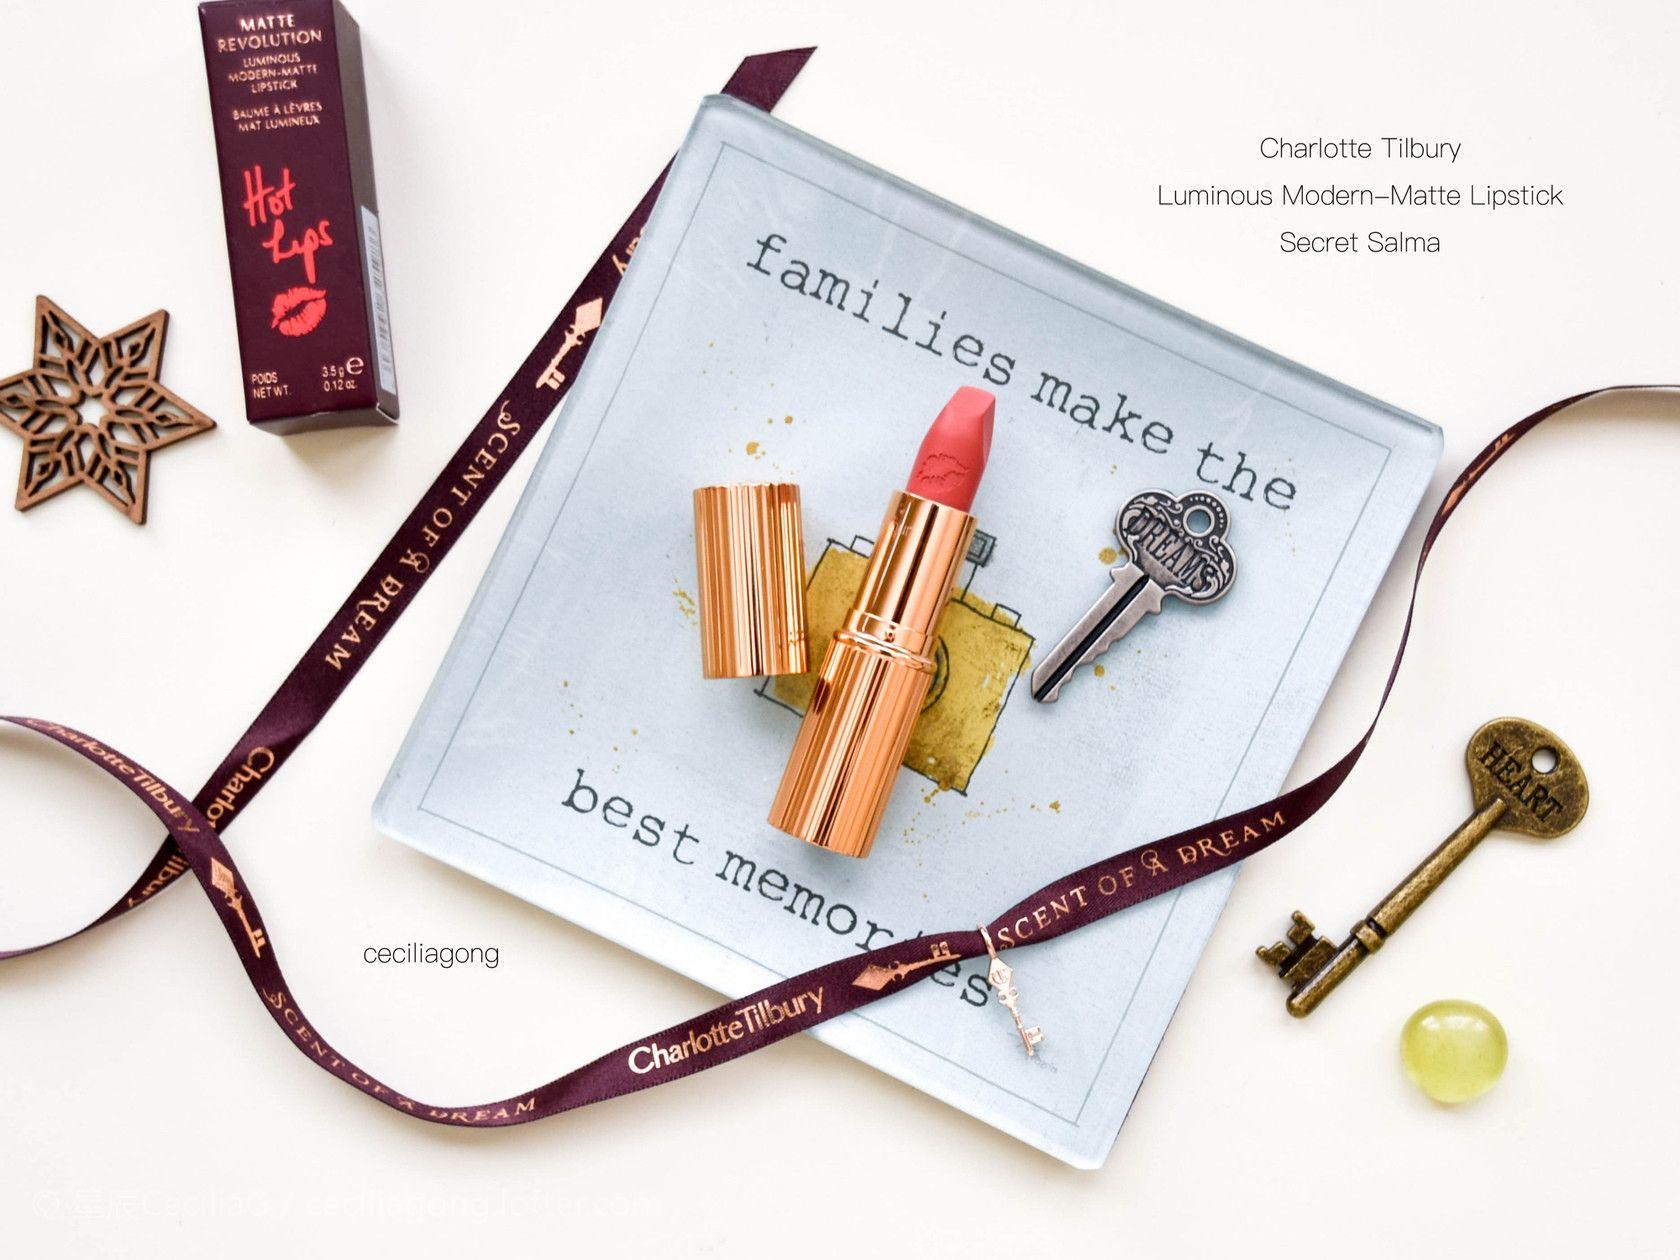 Charlotte Tilbury Hot Lips --SECRET SALMA